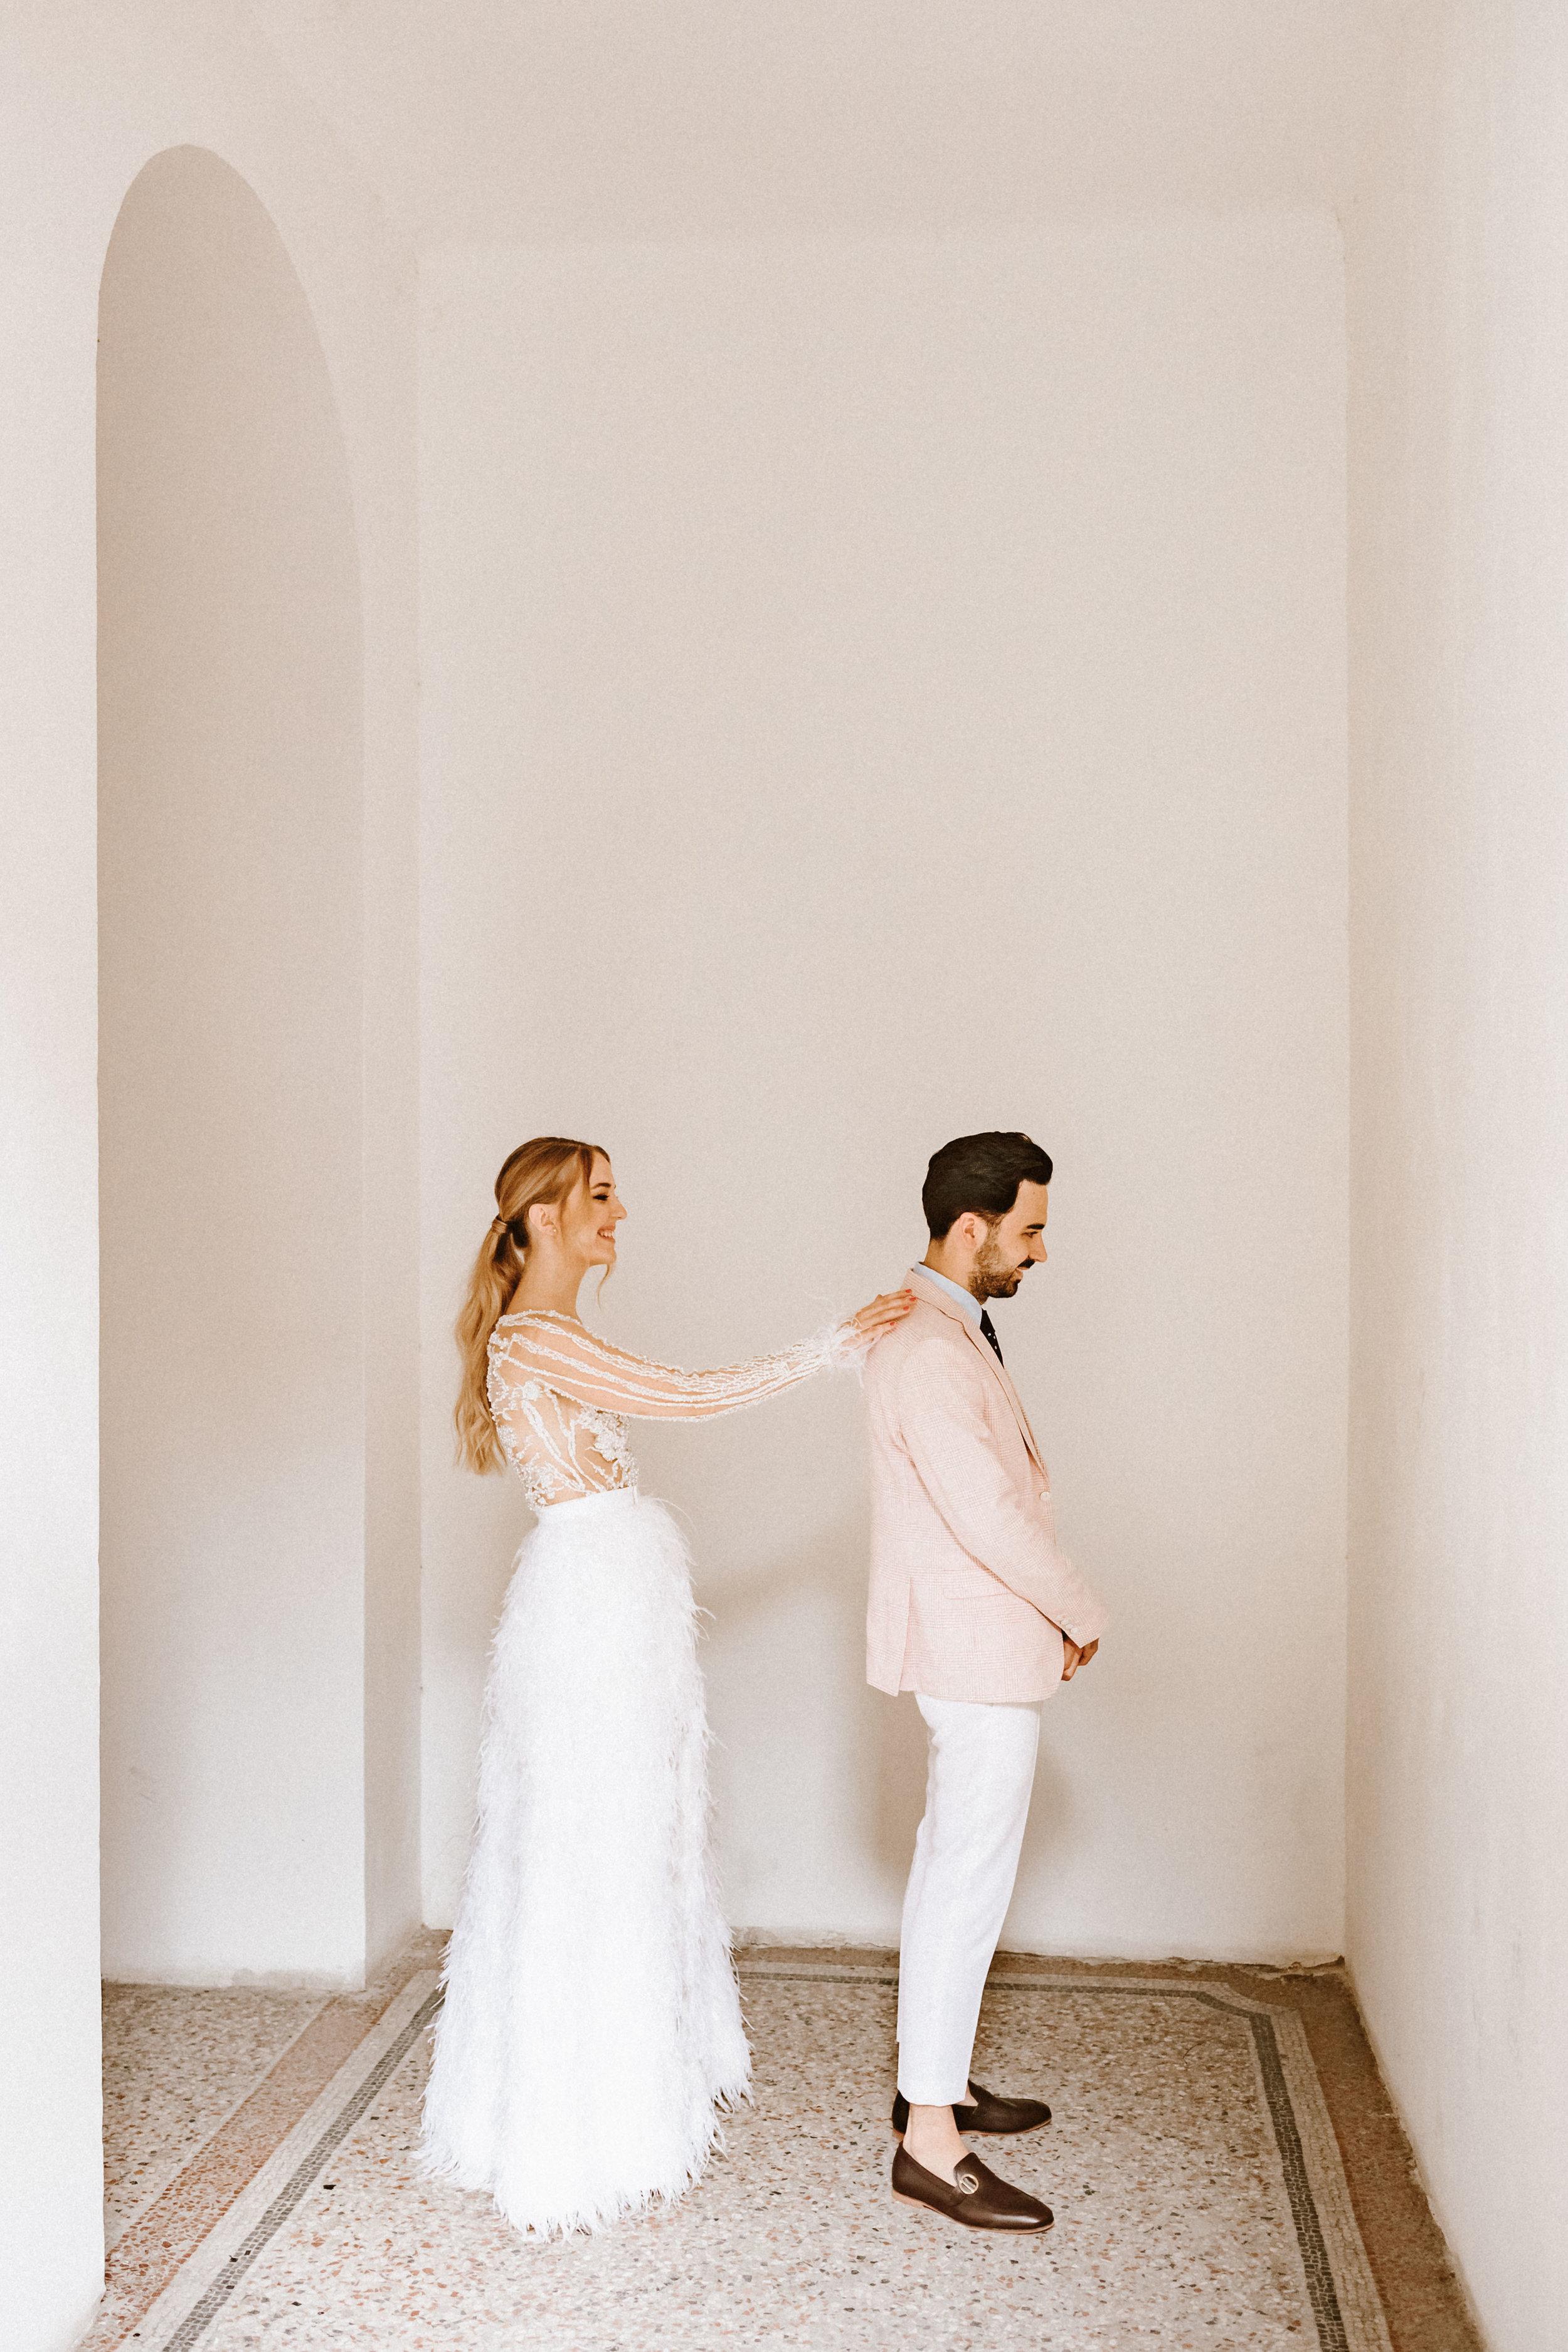 1819-Evelin+Peti-wedding-018-w.jpg